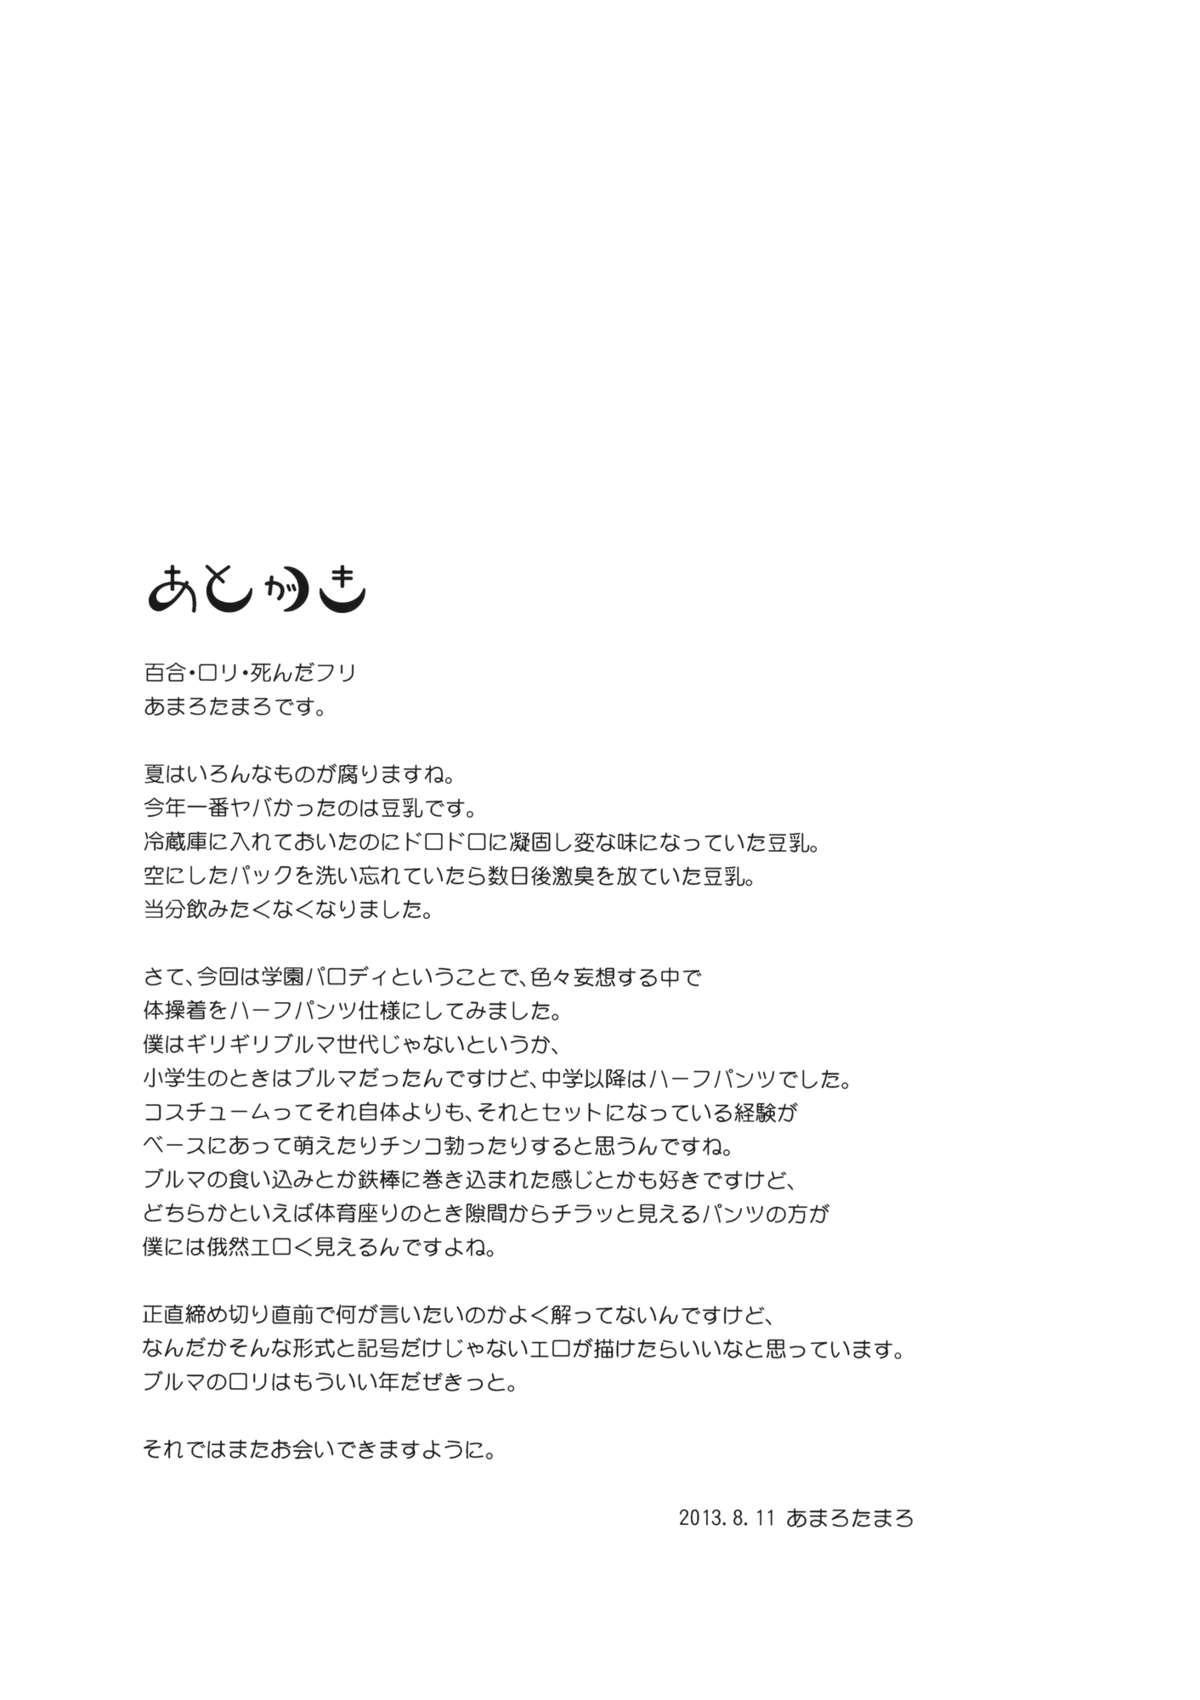 Lovely Girls' Lily Vol. 7 19